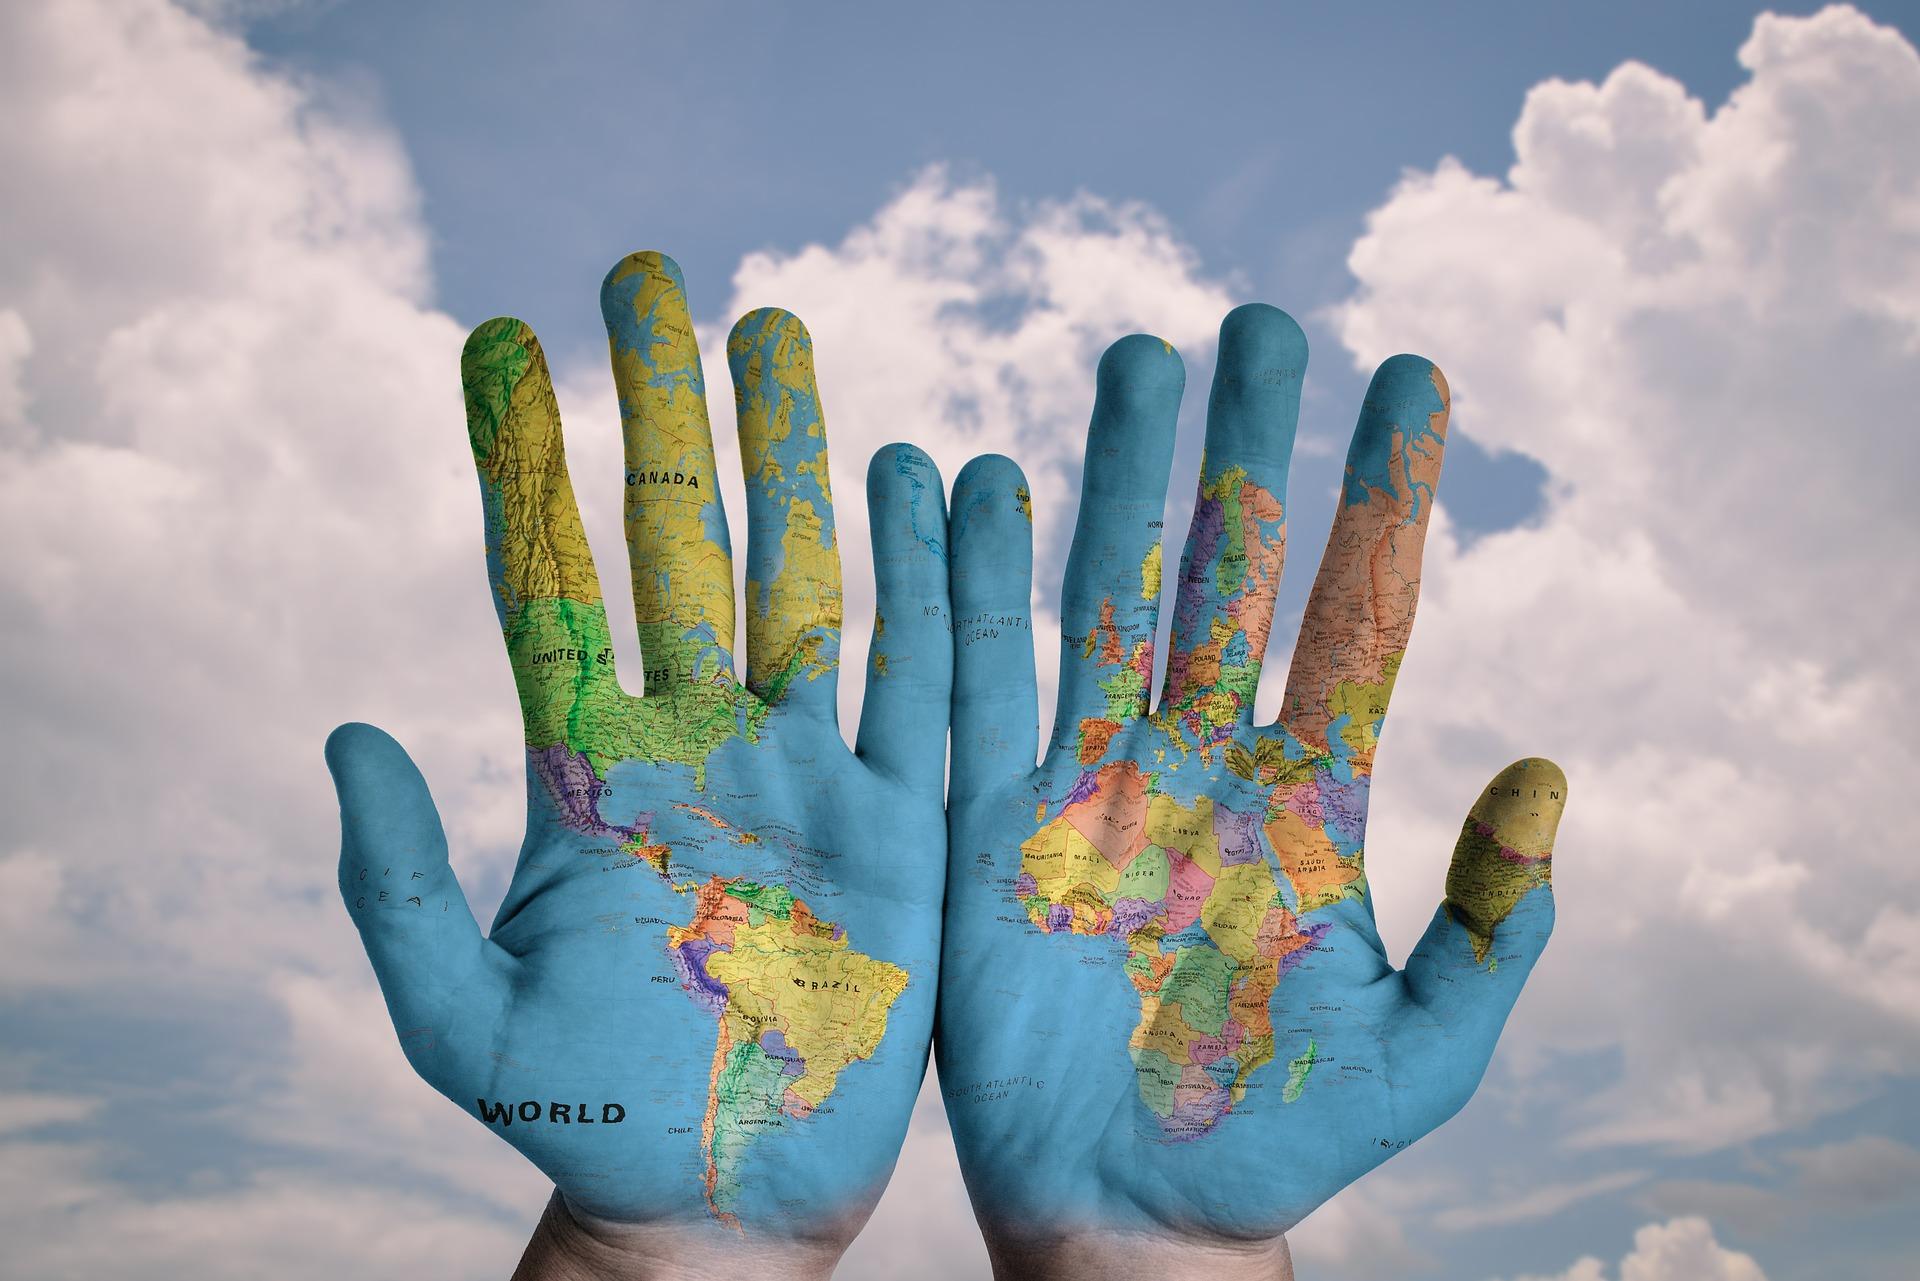 hands help change the world